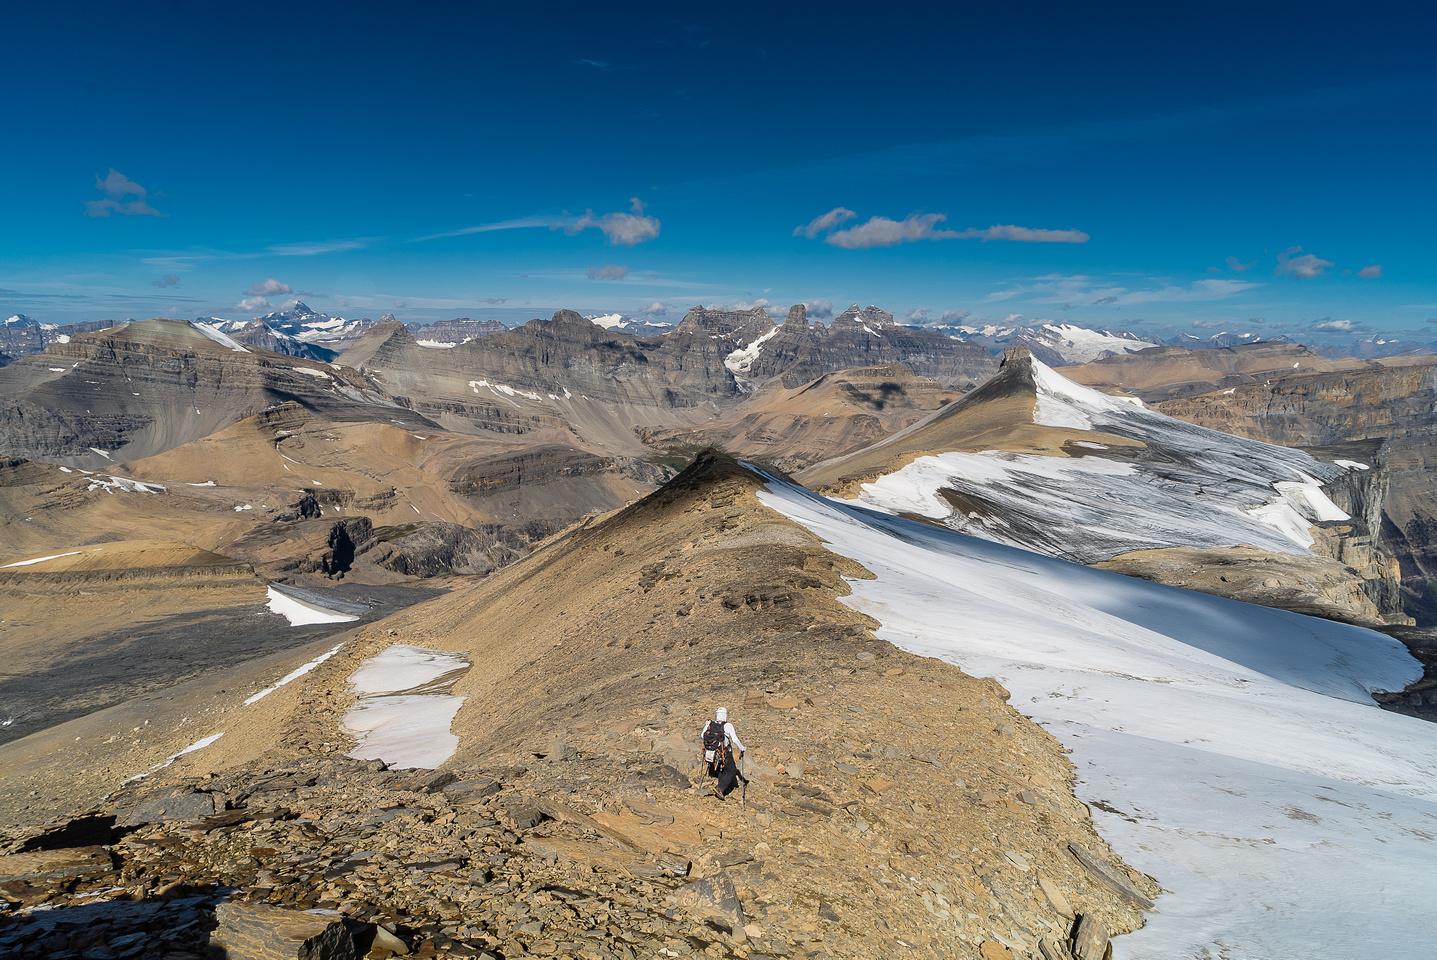 Steven heads down Marmota Peak.